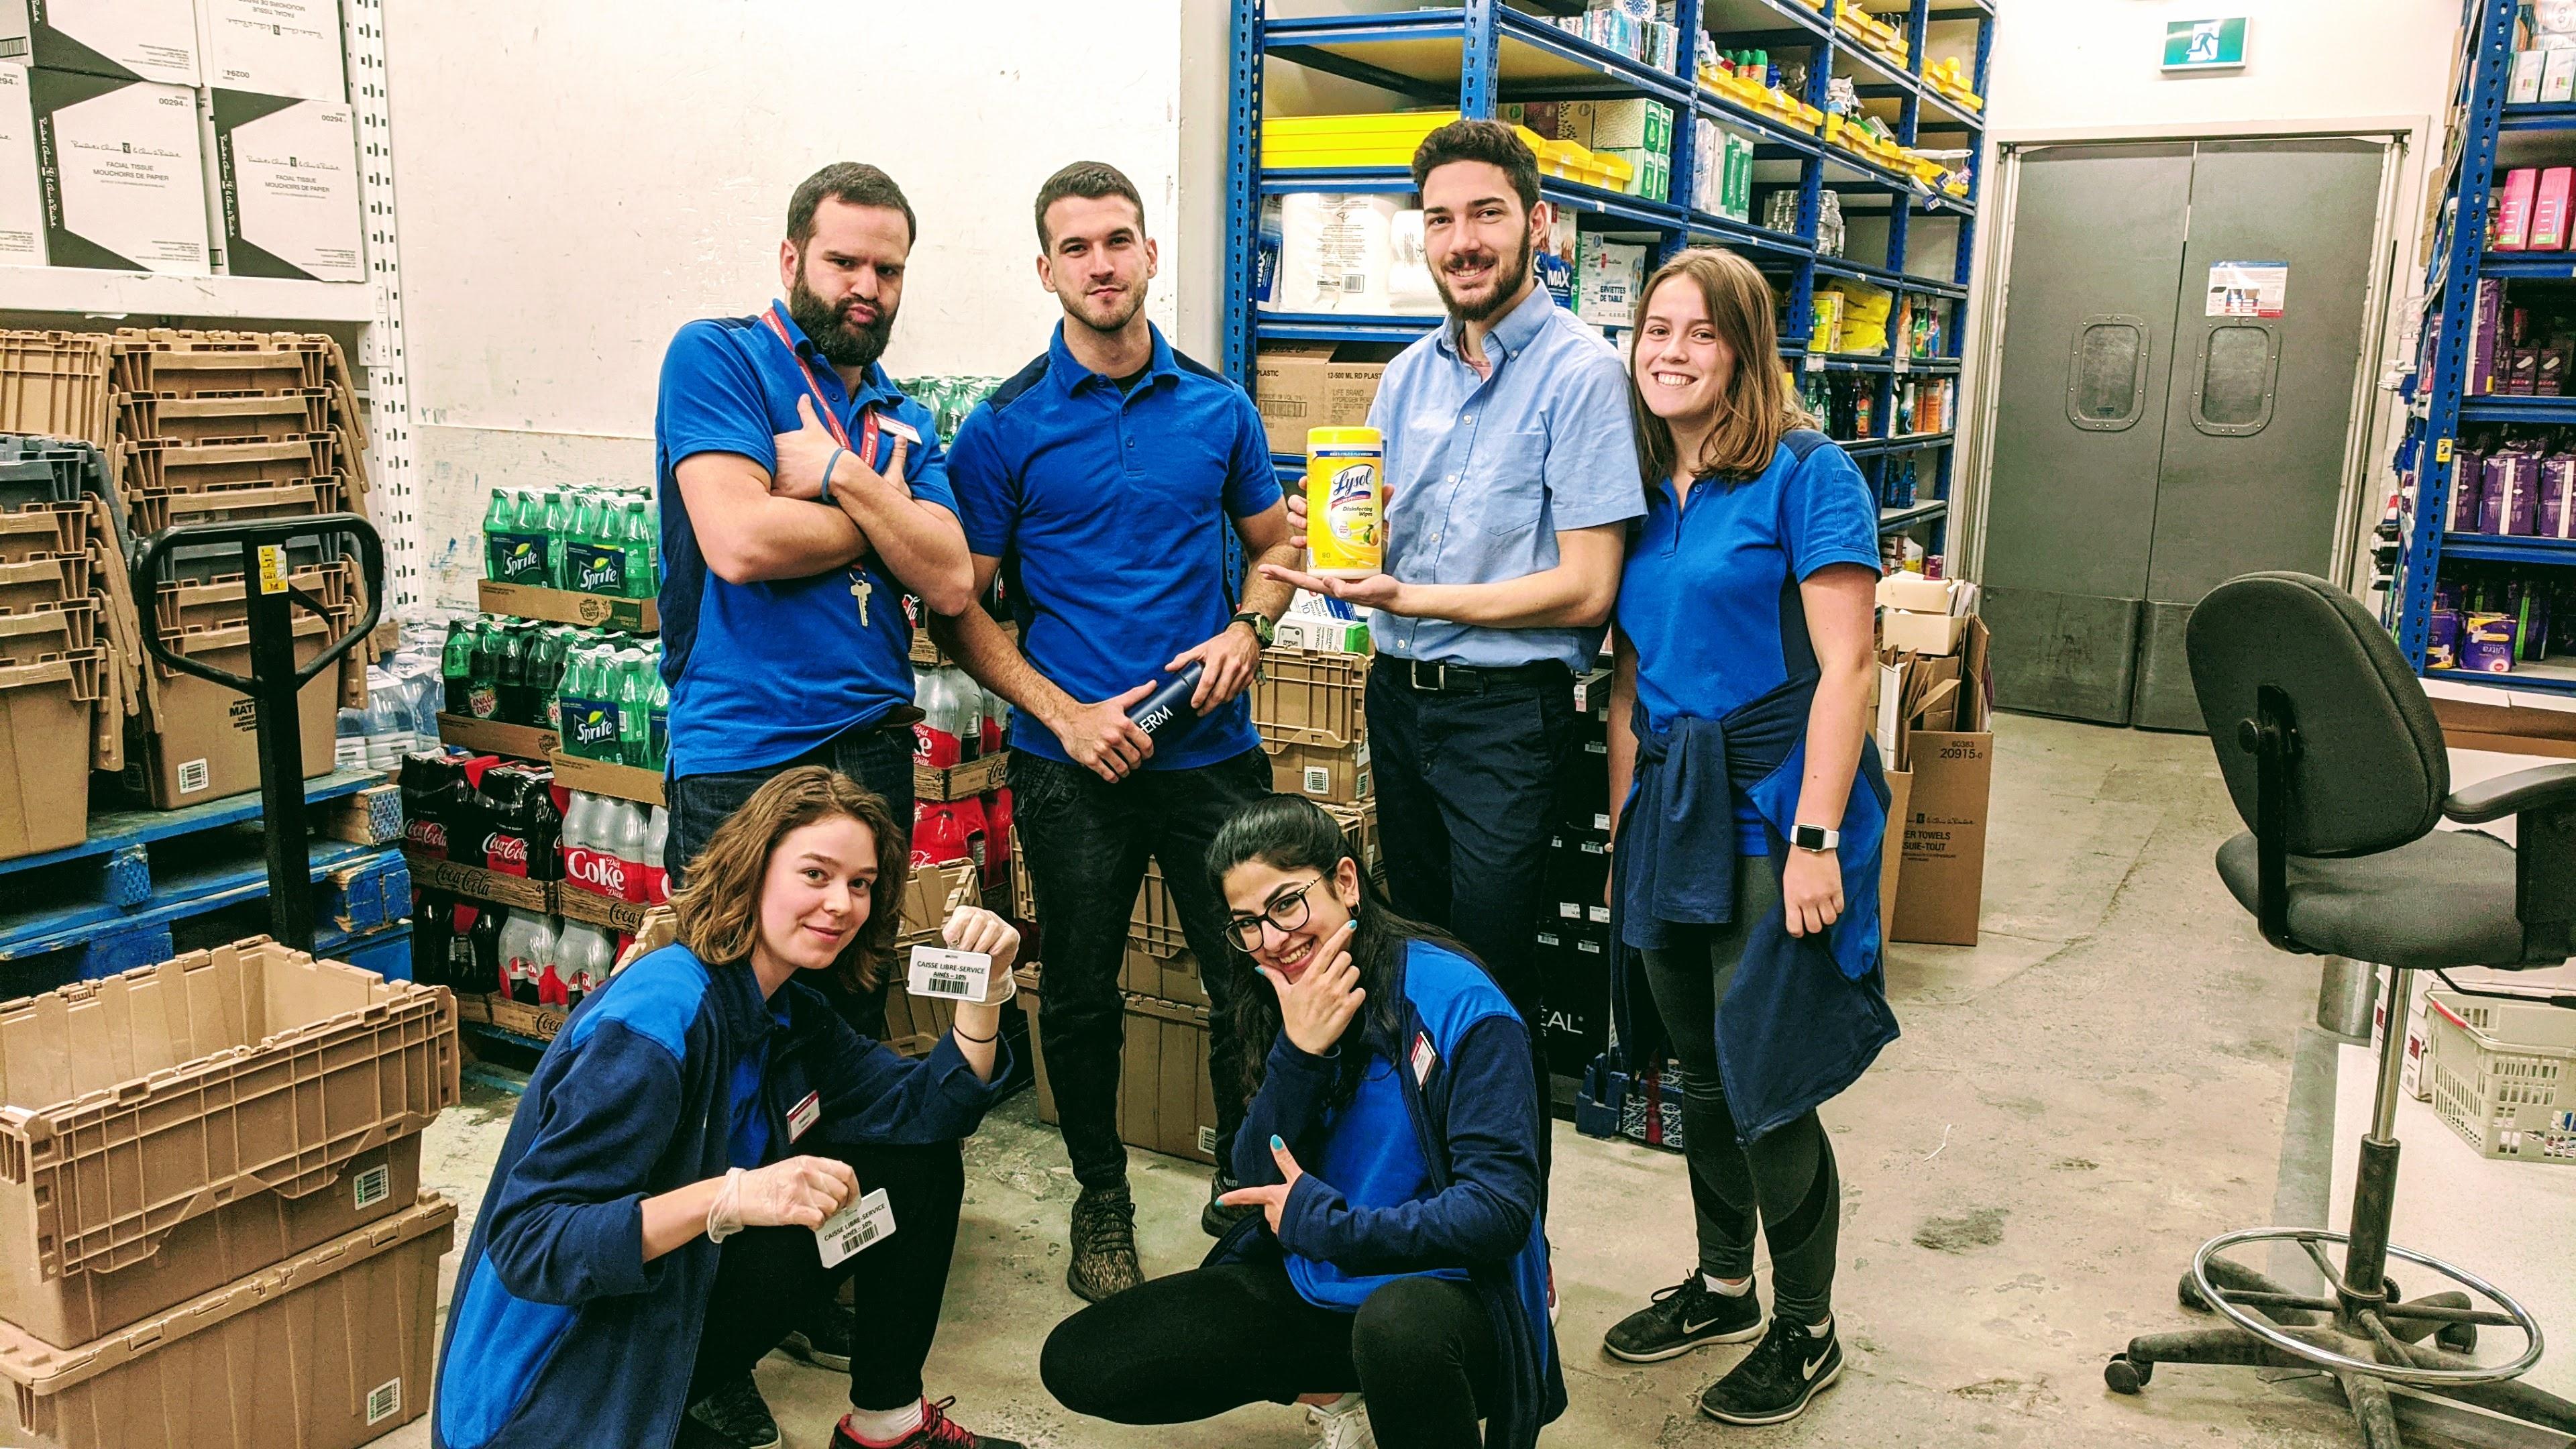 équipe travail corona virus